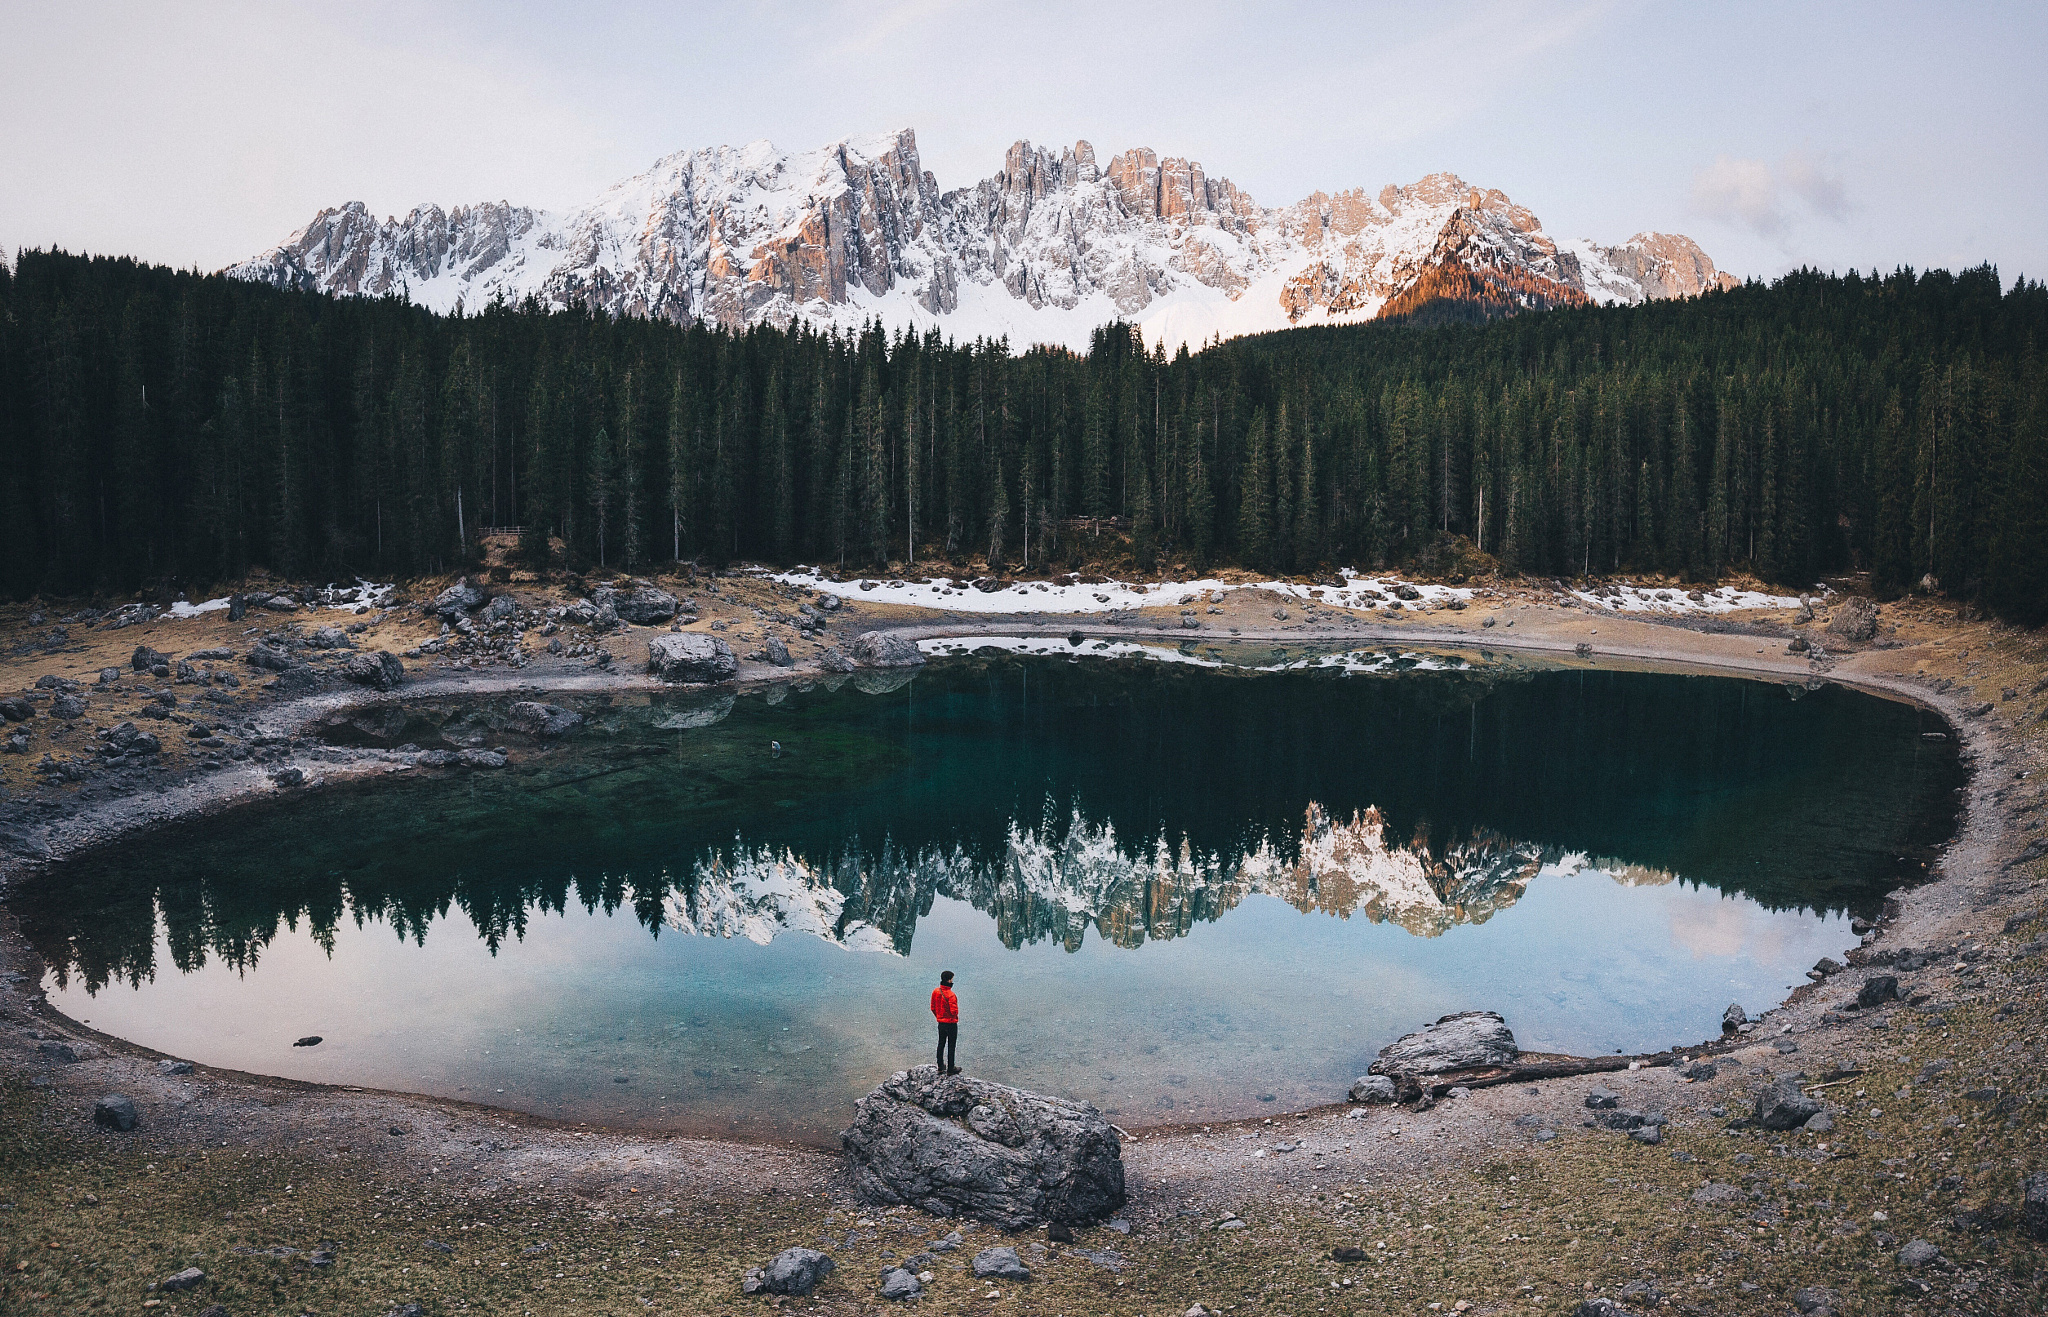 Interview: Johannes Hulsch's Travel Photos & Tips Will Inspire Your Wanderlust